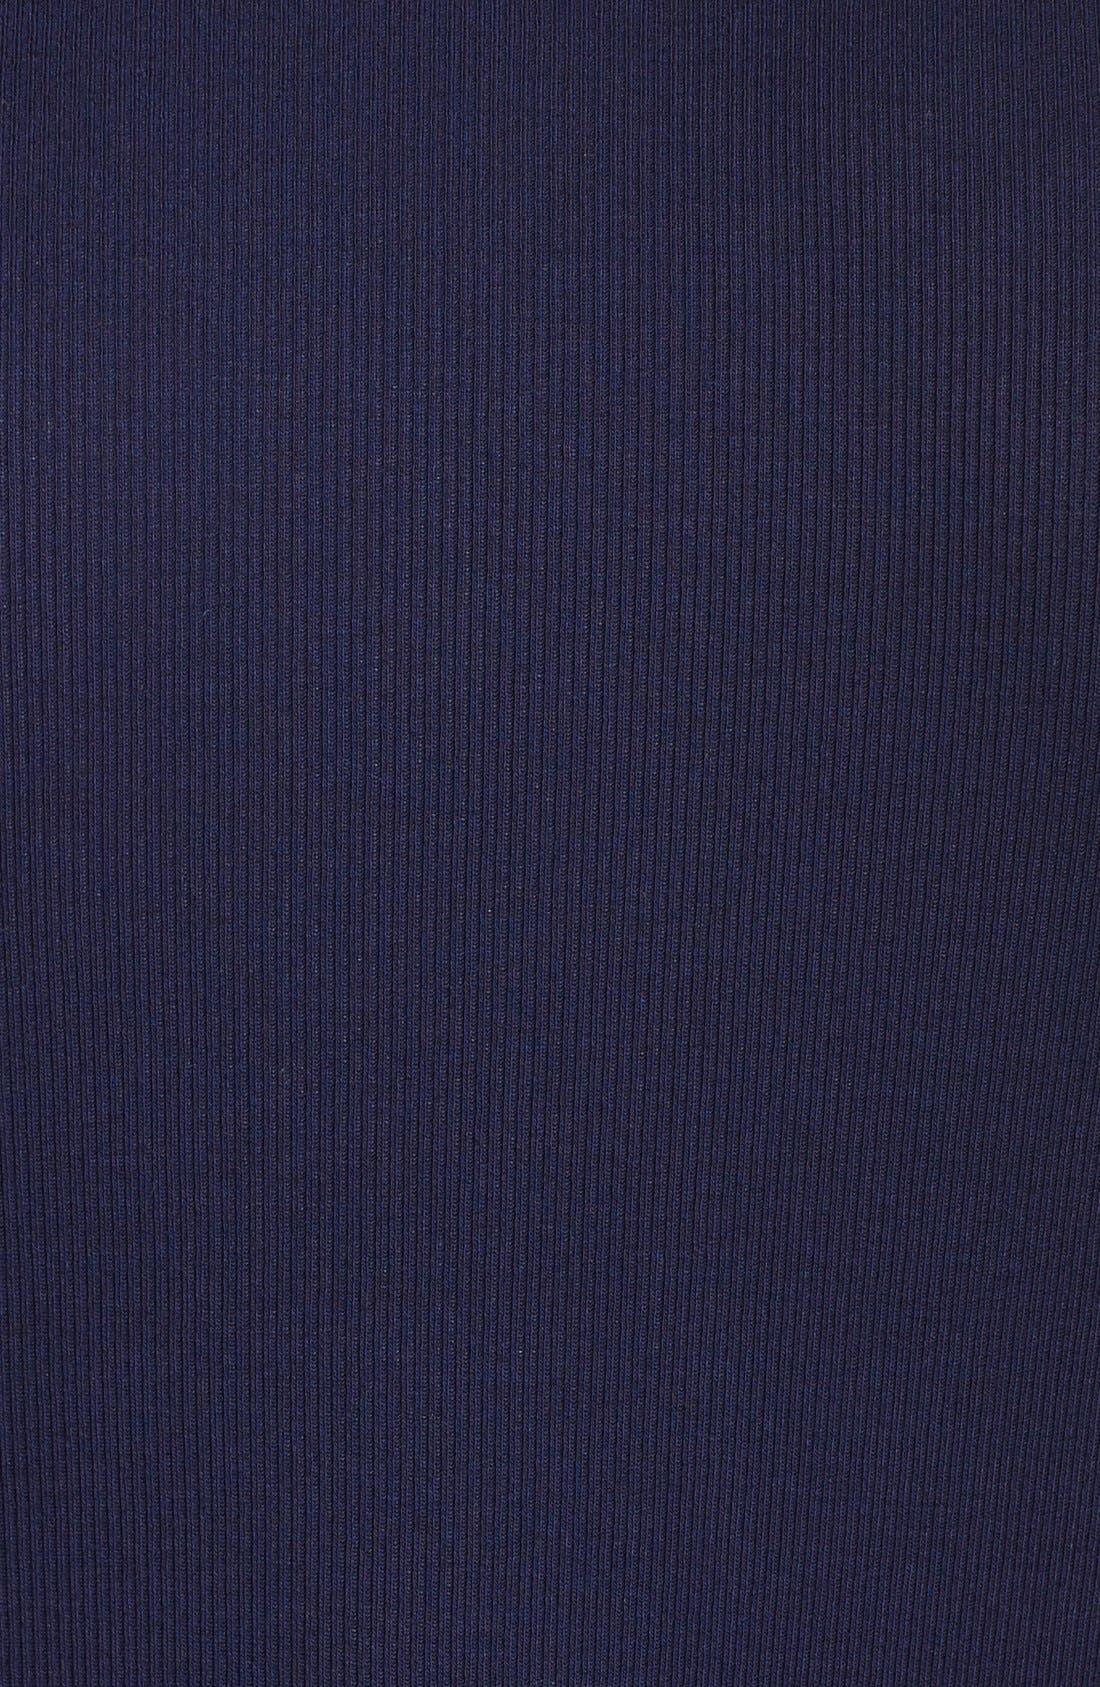 Sleeveless Rib Knit Top,                             Alternate thumbnail 10, color,